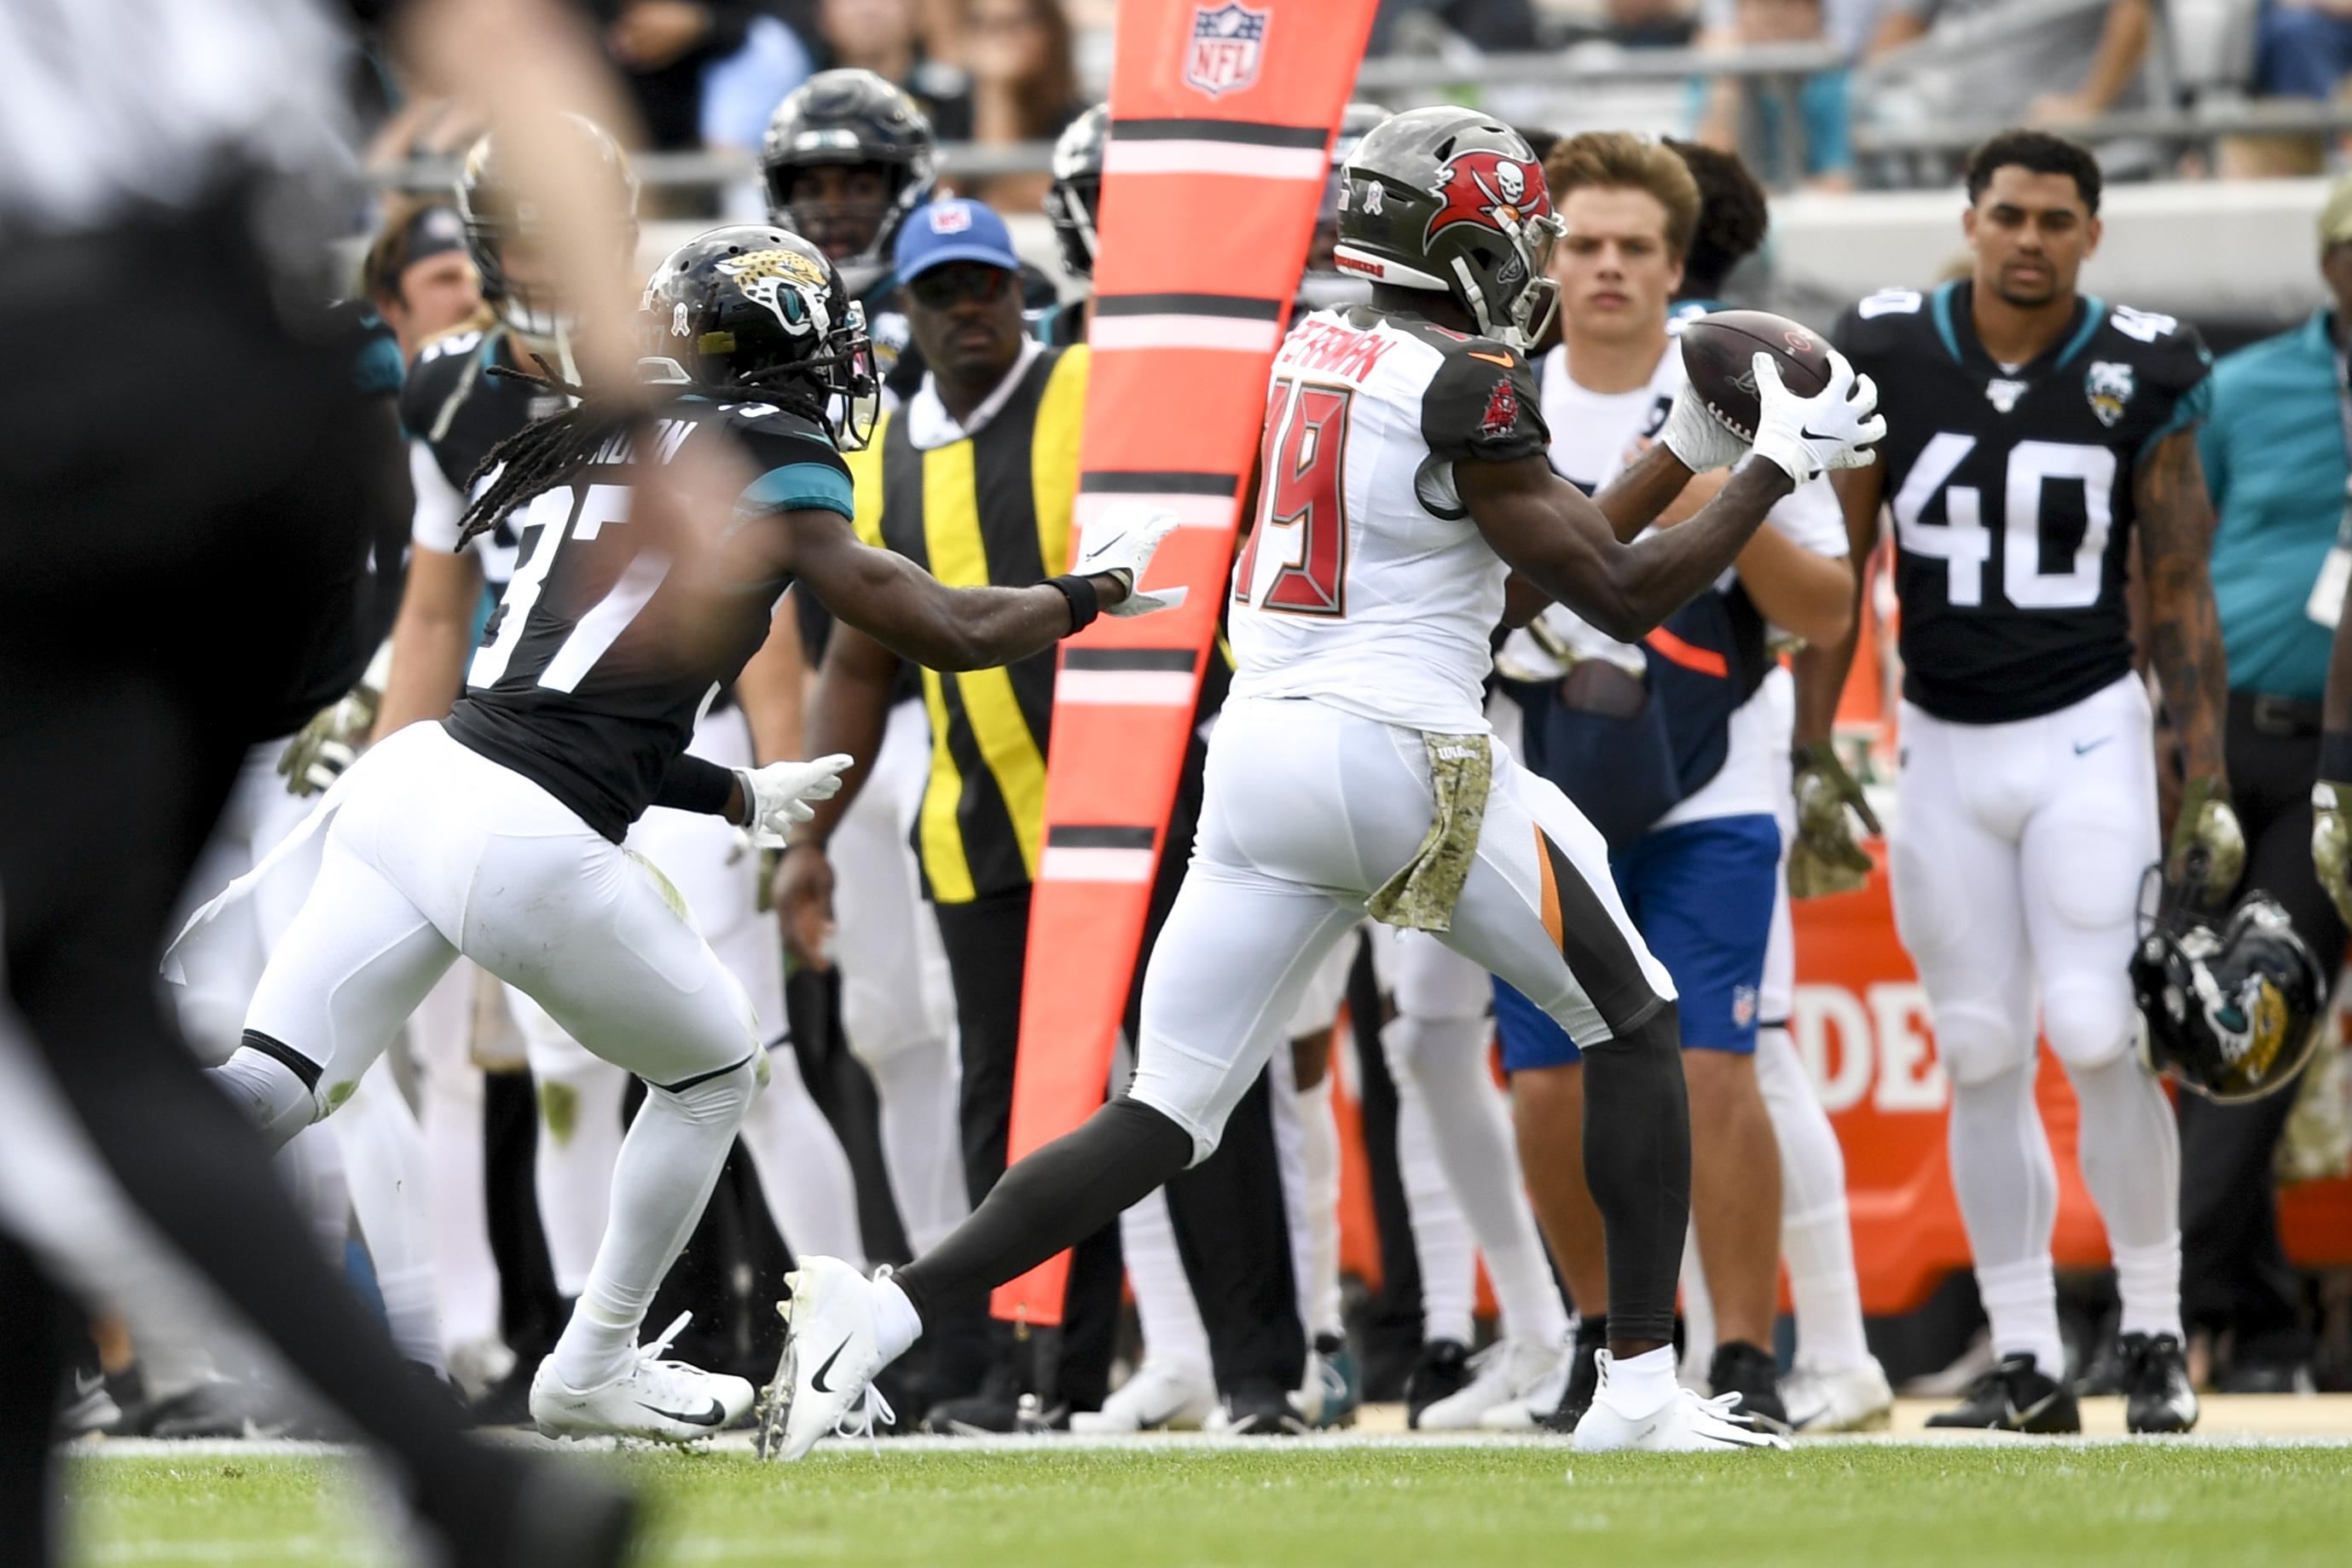 NFL: Tampa Bay Buccaneers at Jacksonville Jaguars